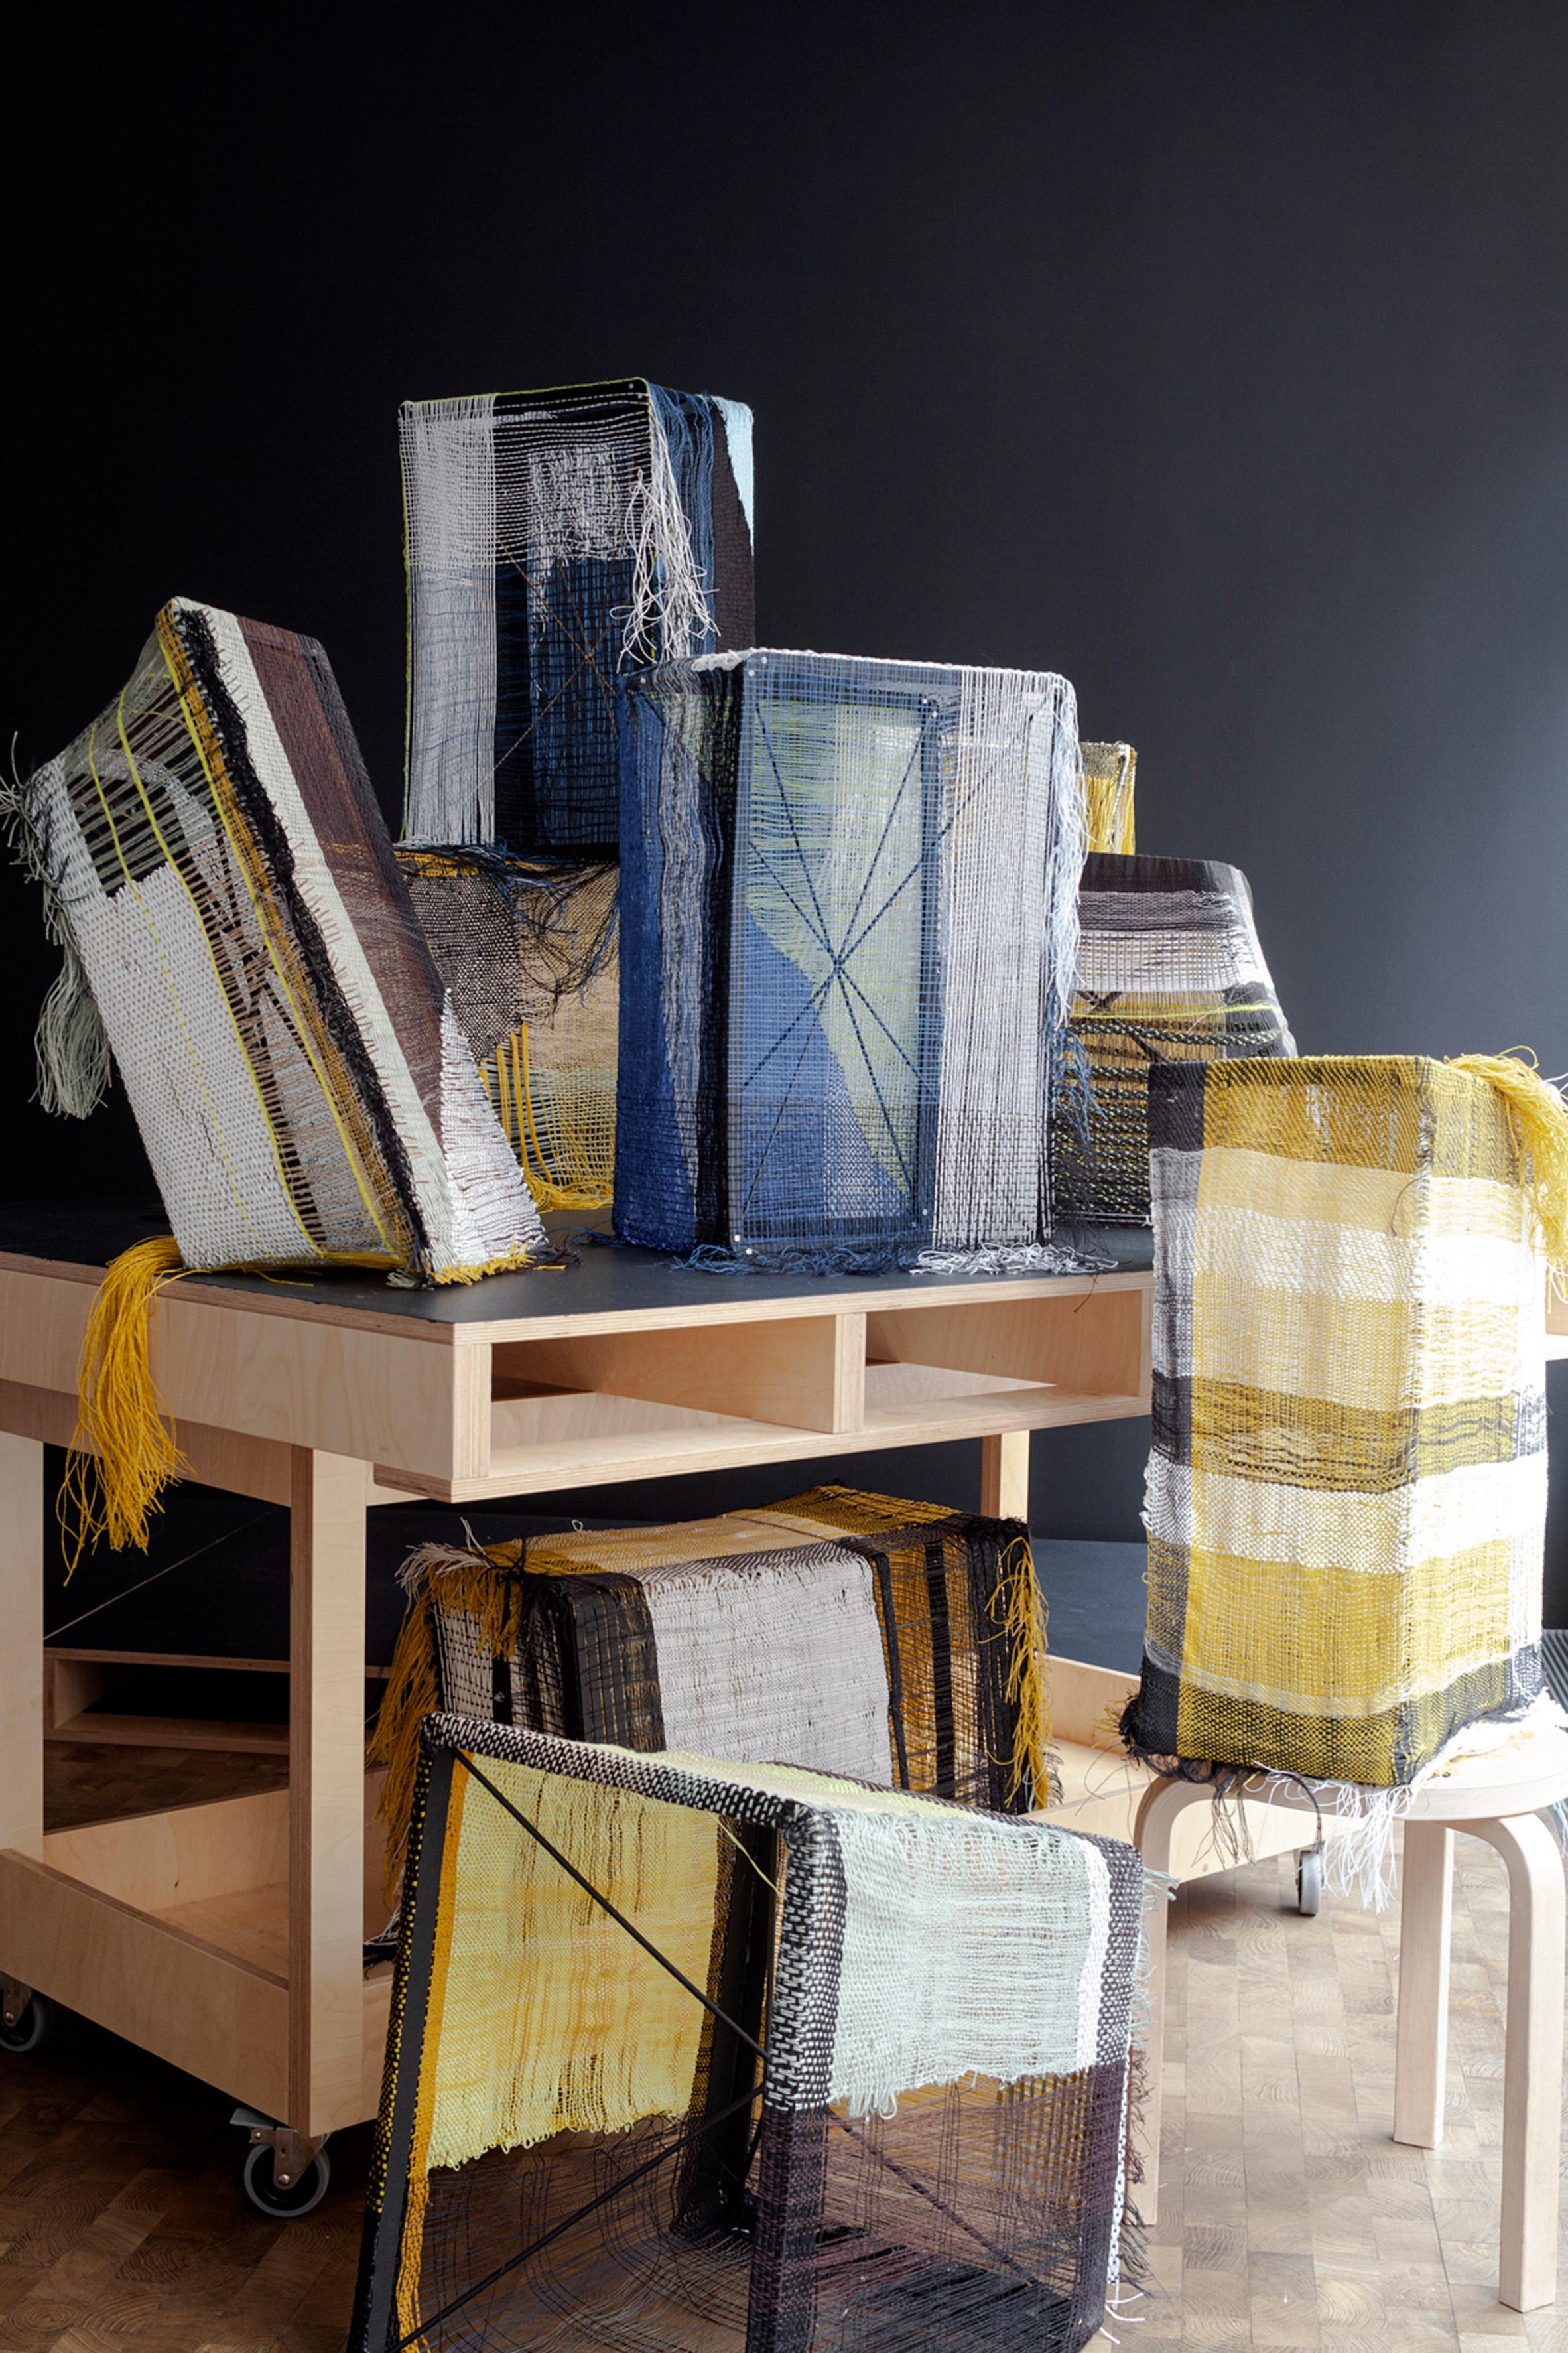 Hella Jongerius Interlace Textile Research exhibition